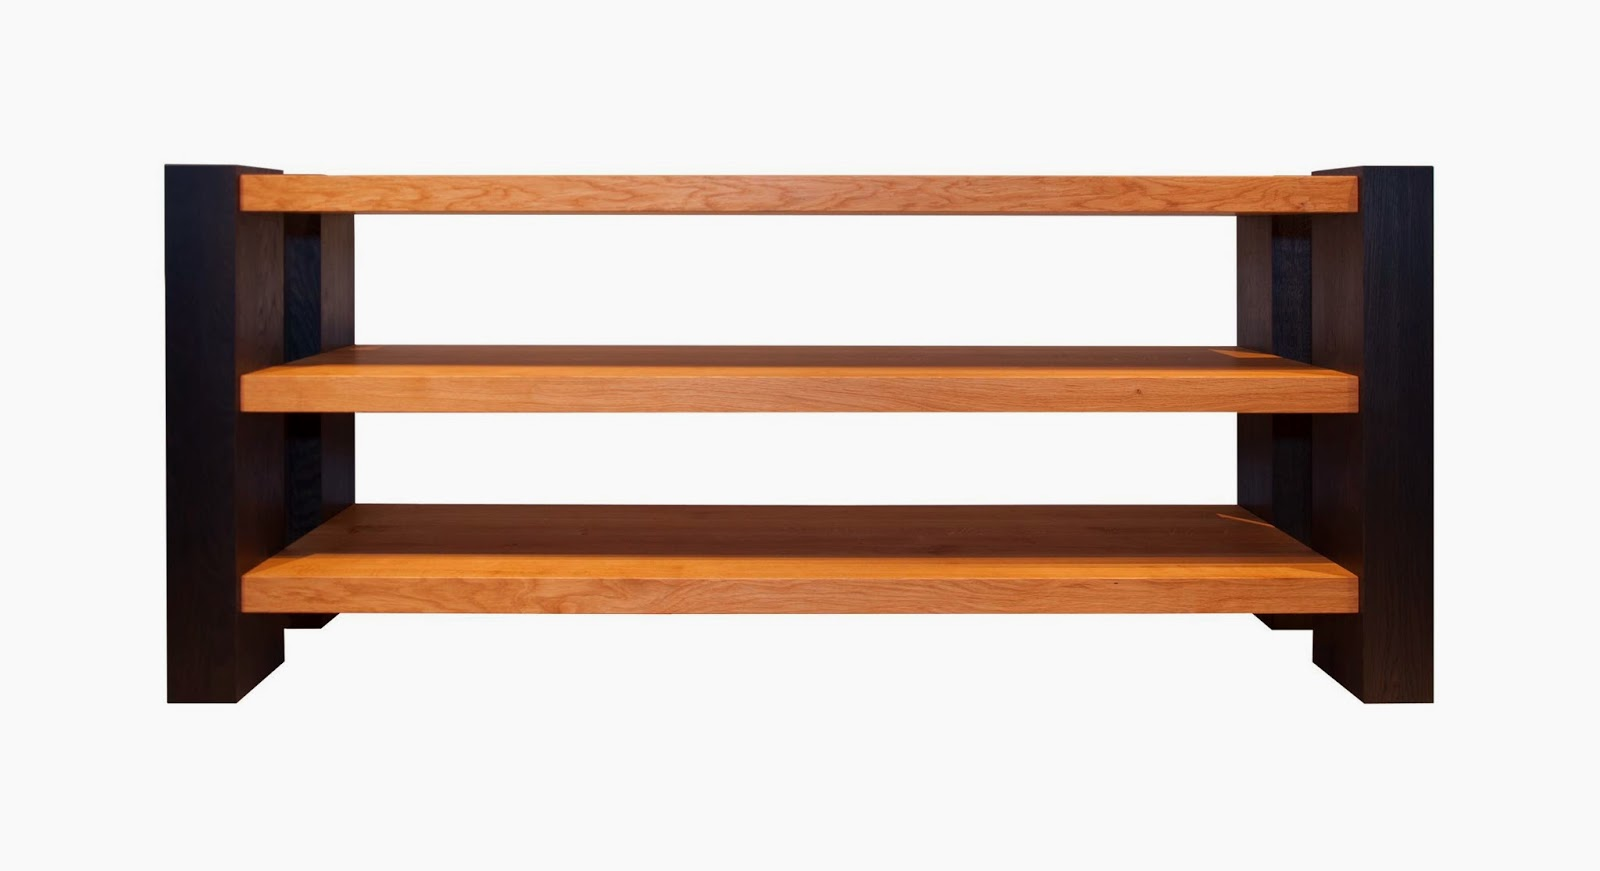 Hifi Furniture Wood High Quality Fenrez Com Sammlung Von  # Hifi Furniture Wood High Quality